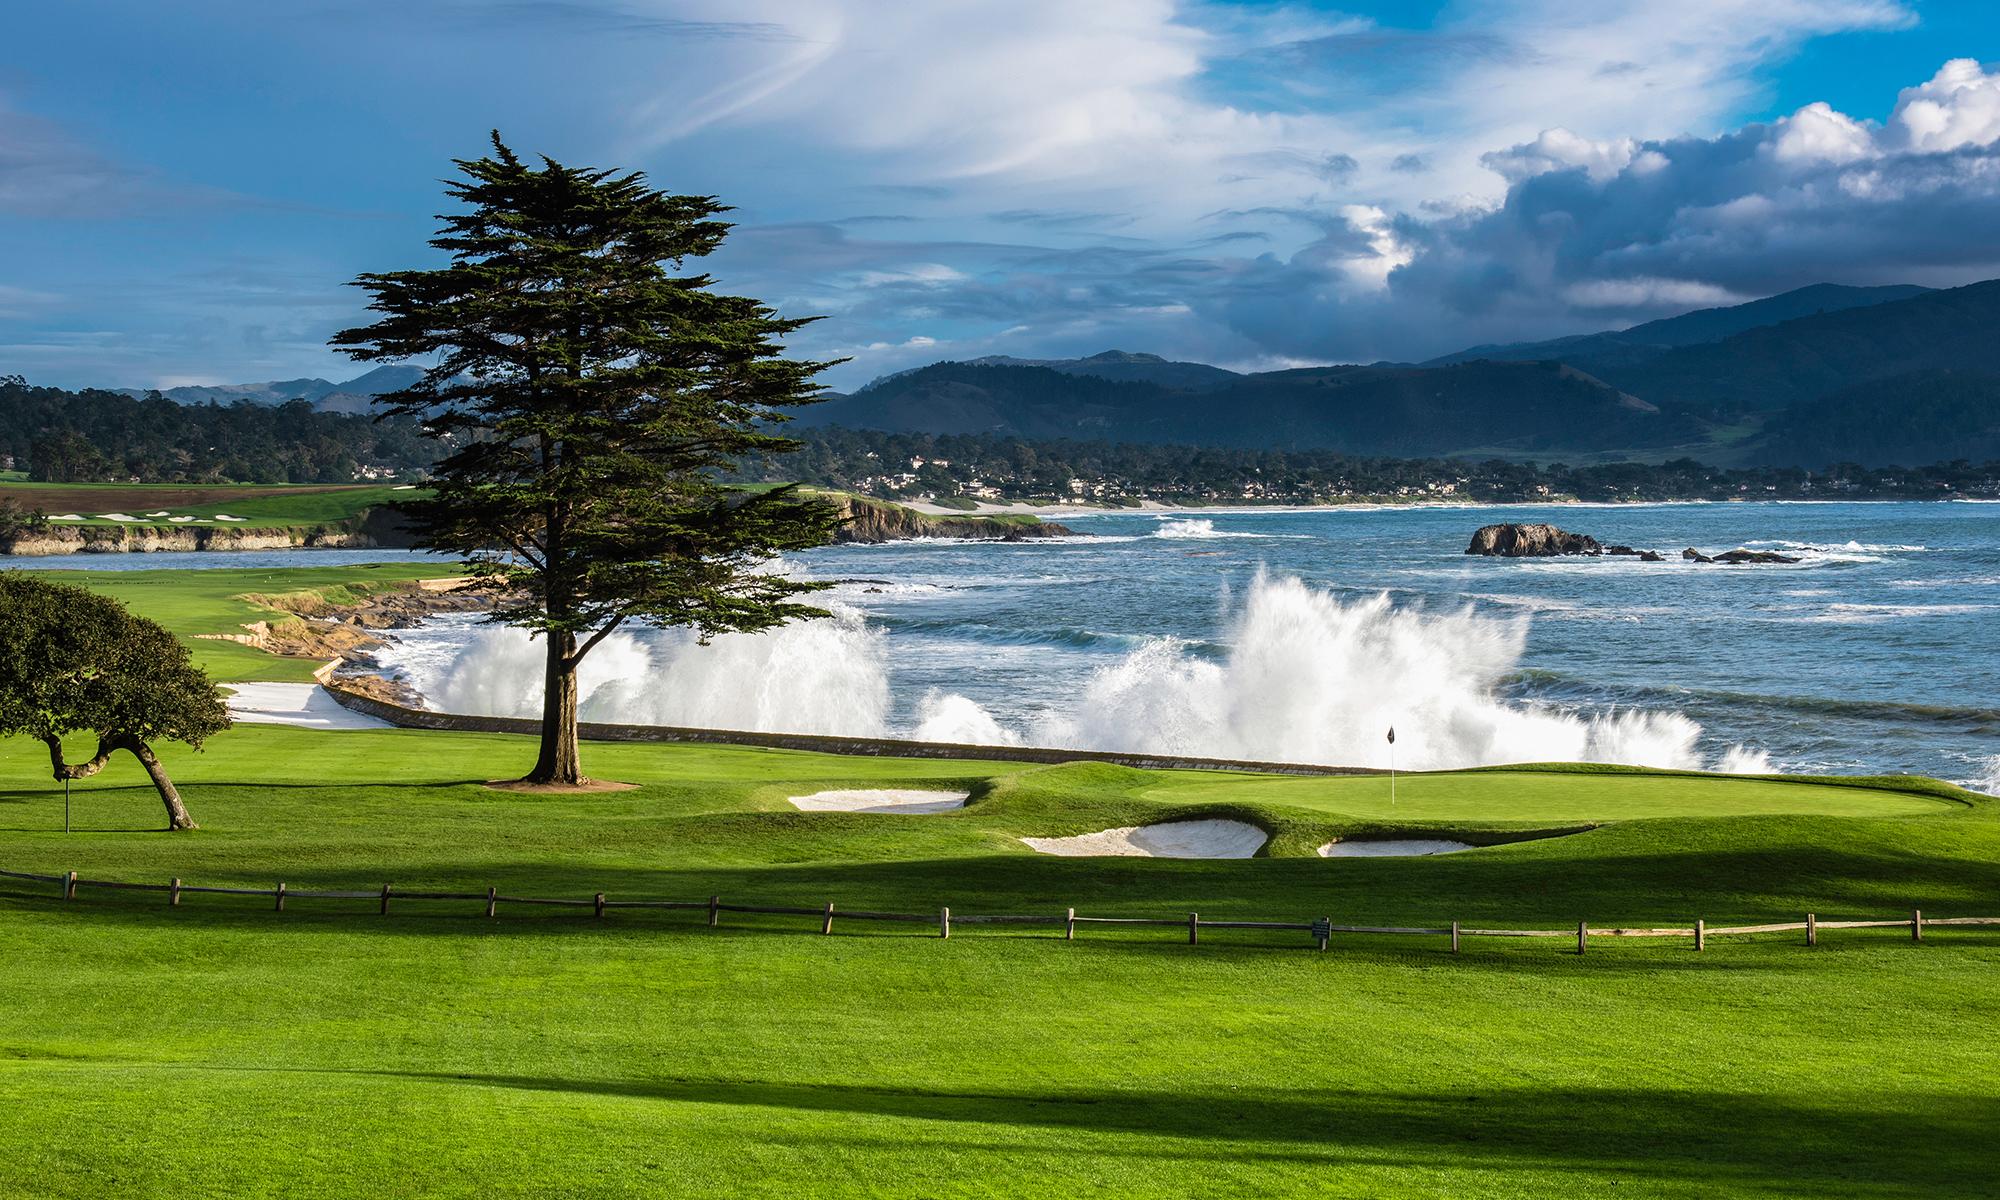 Legendary Golf Courses at Pebble Beach Resorts, California